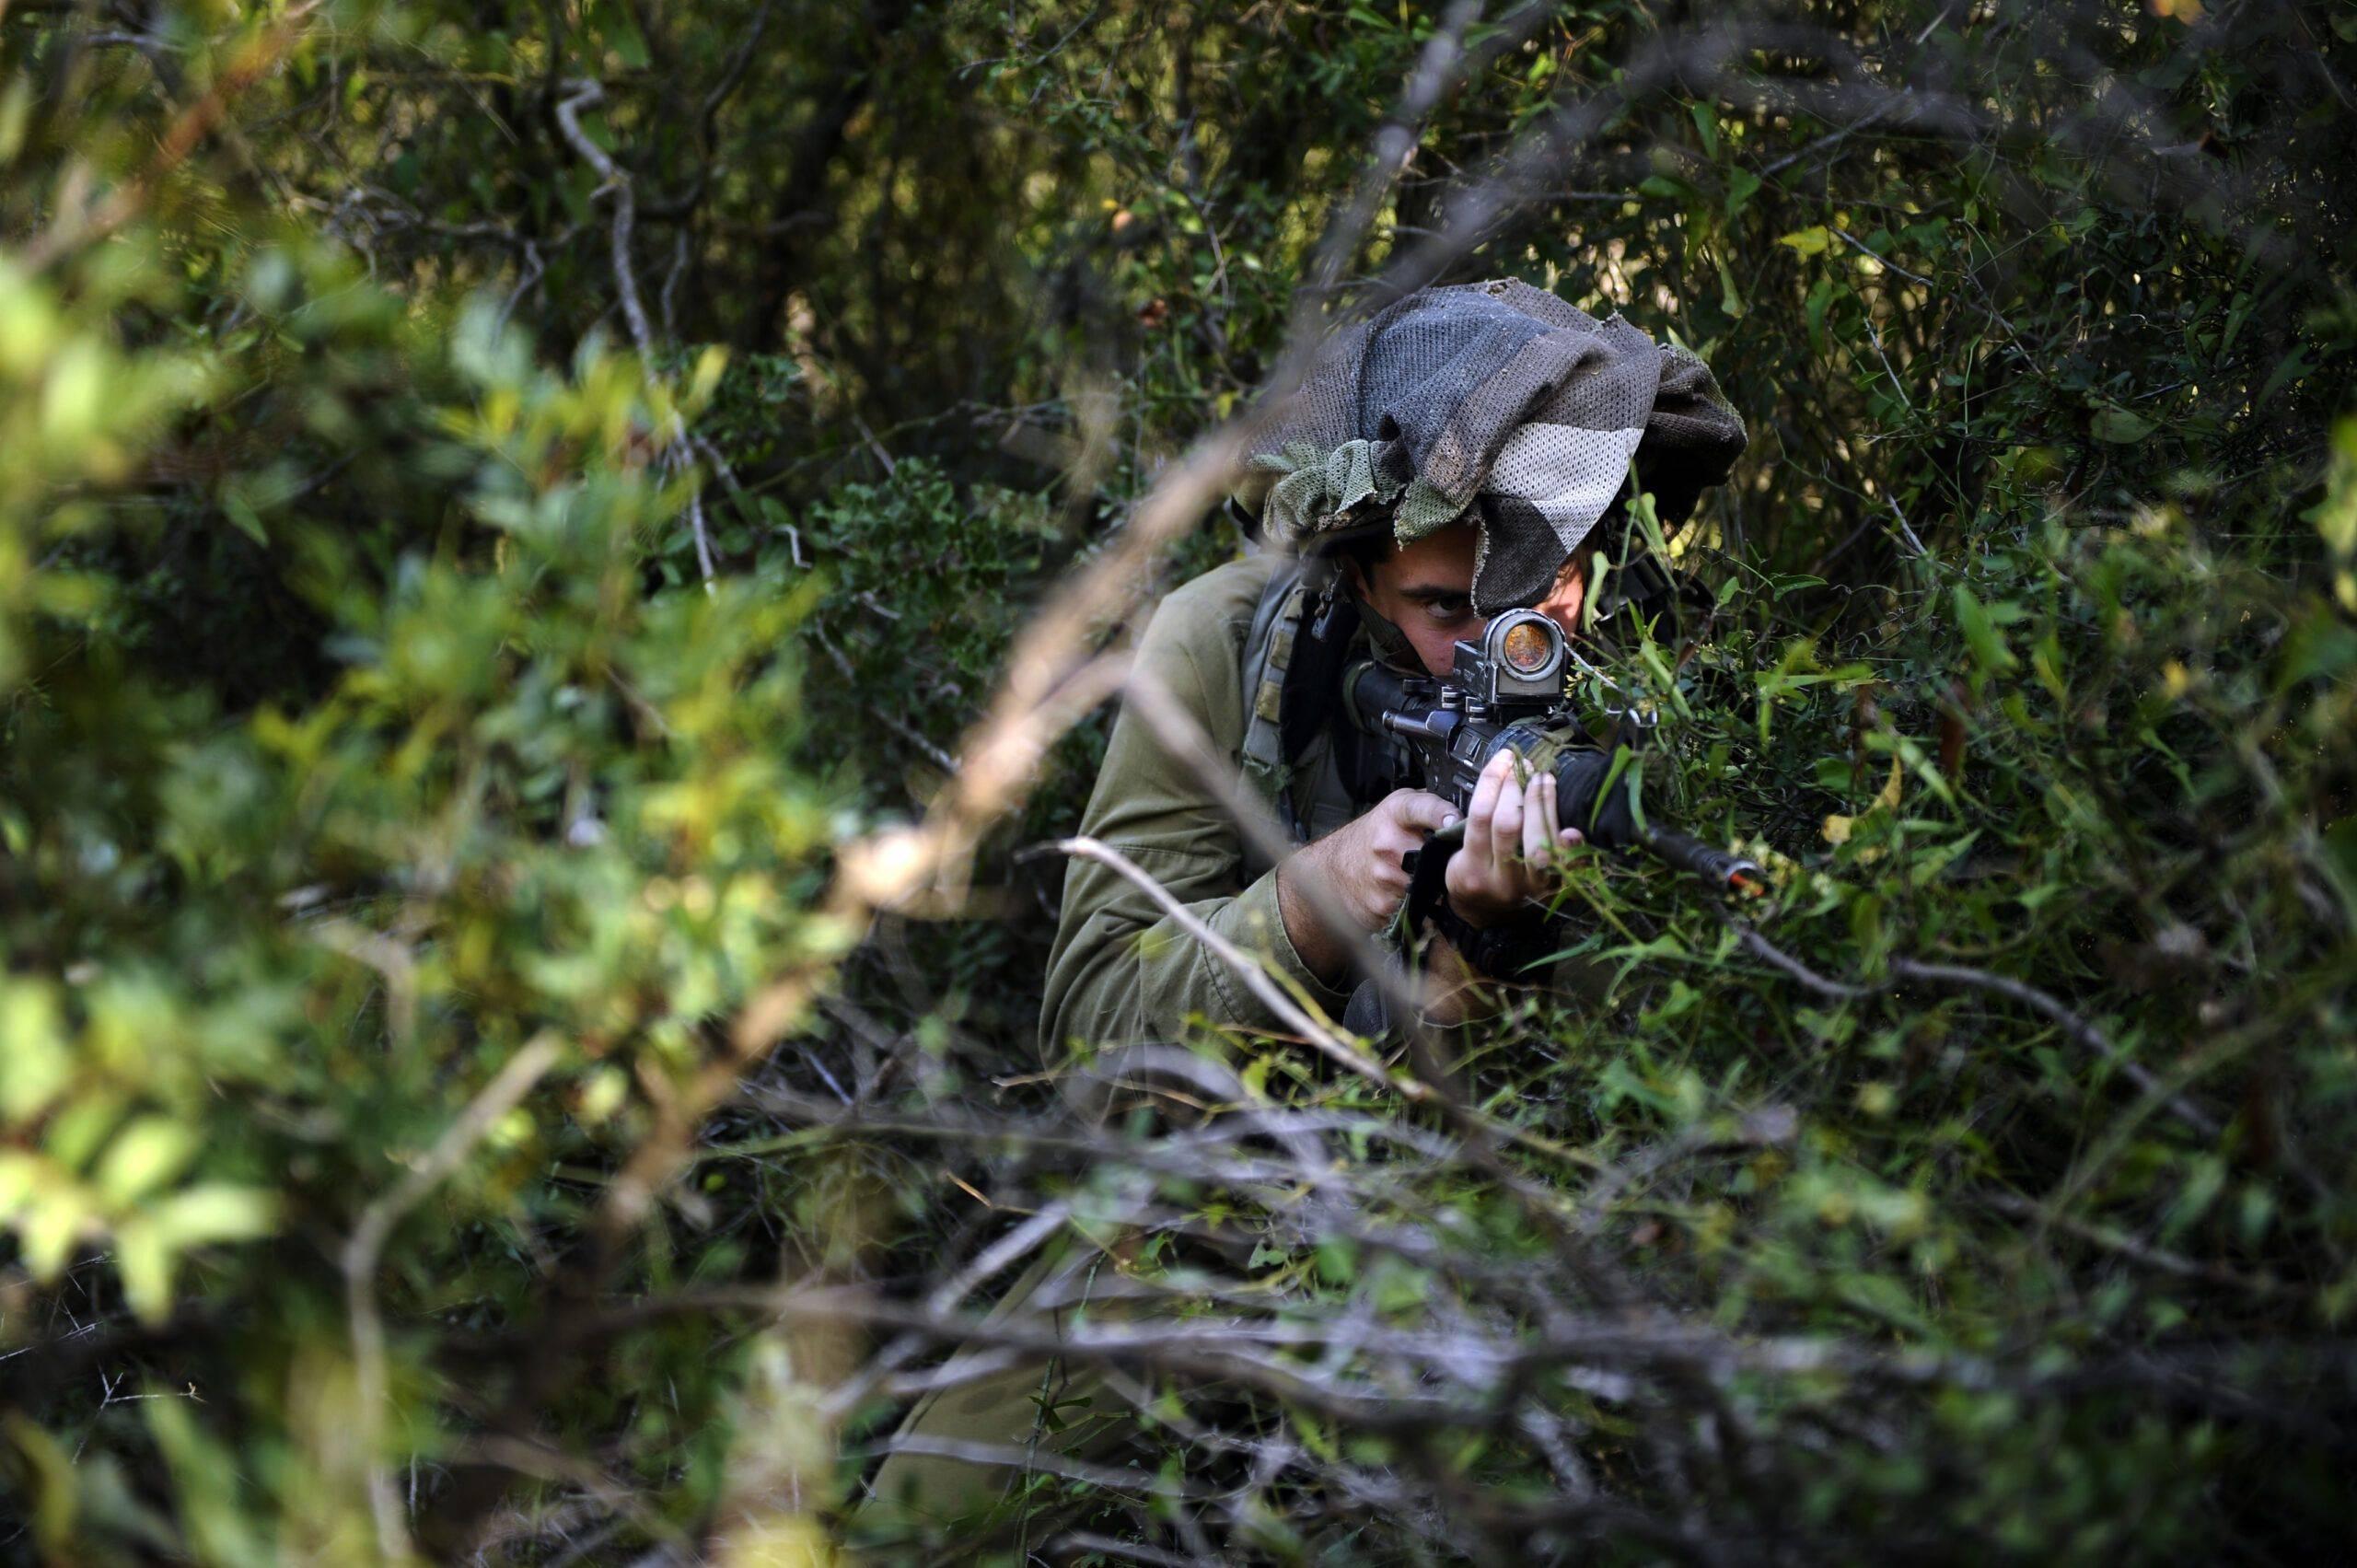 The Israeli Mossad's Kidon Unit